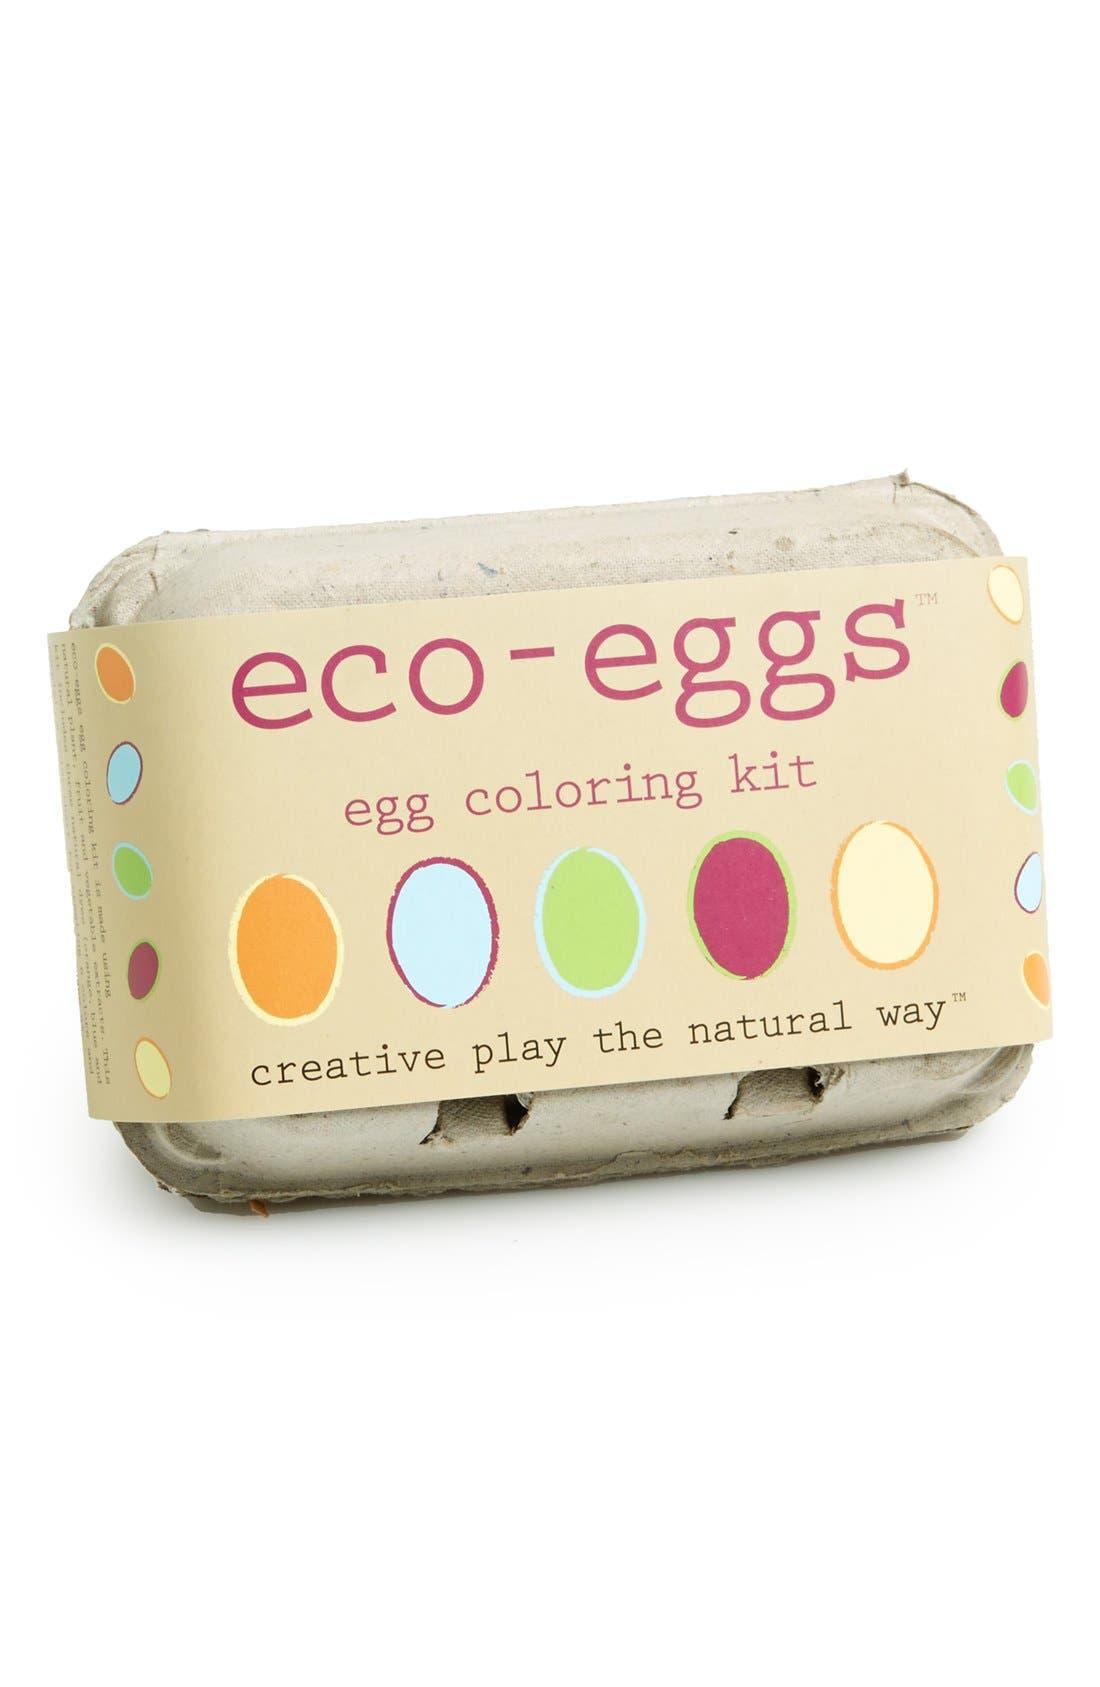 Alternate Image 1 Selected - Eco Kids 'Eco-Eggs' Egg Coloring Kit